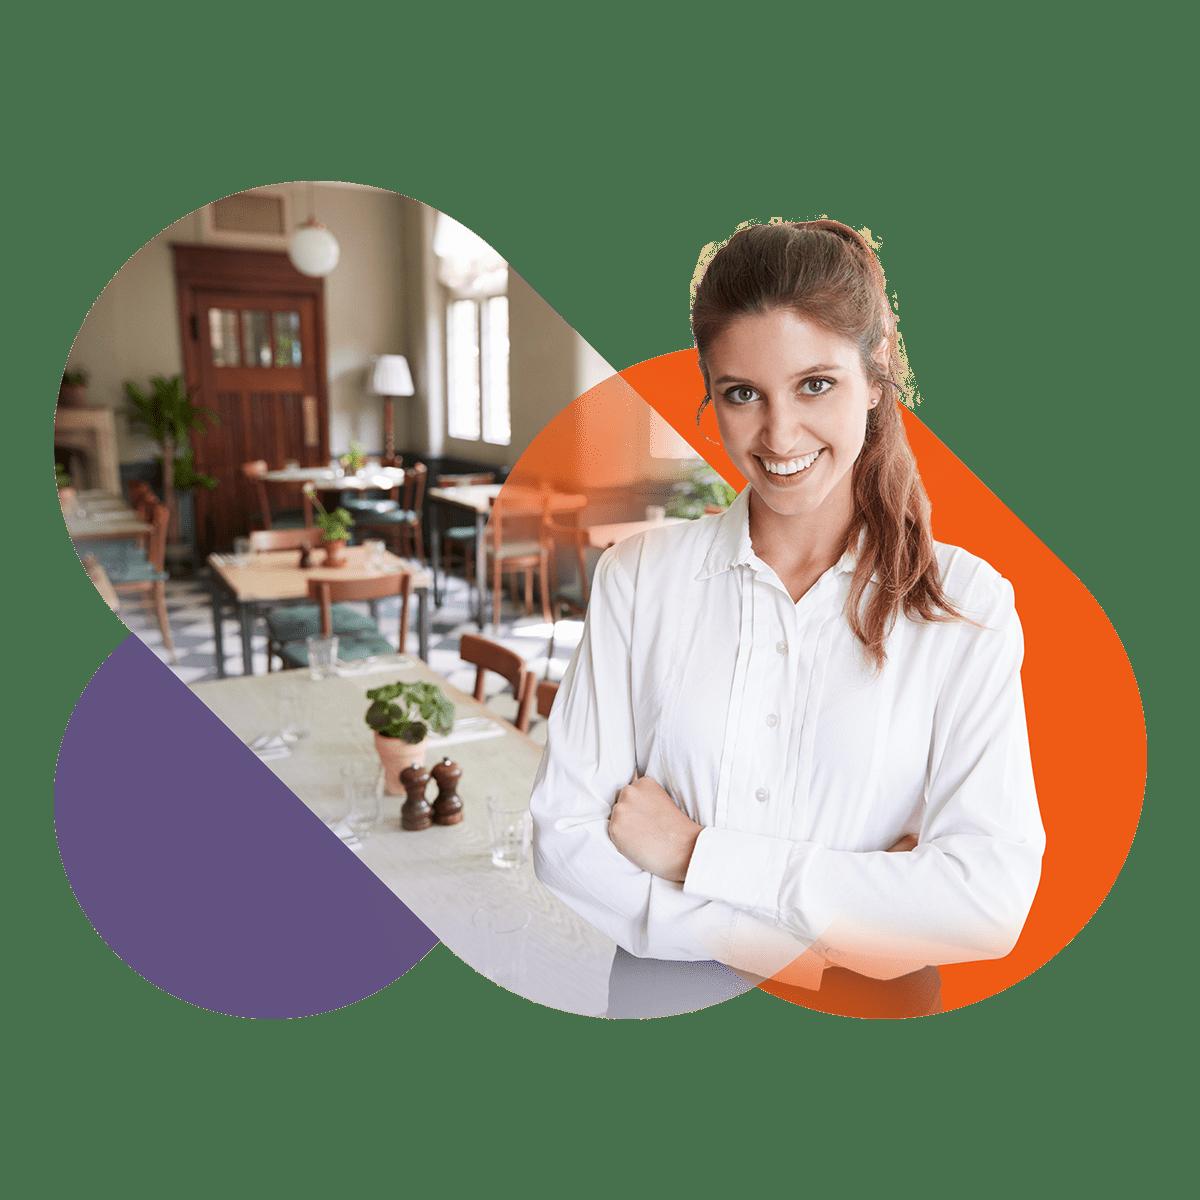 POS_restaurants-min